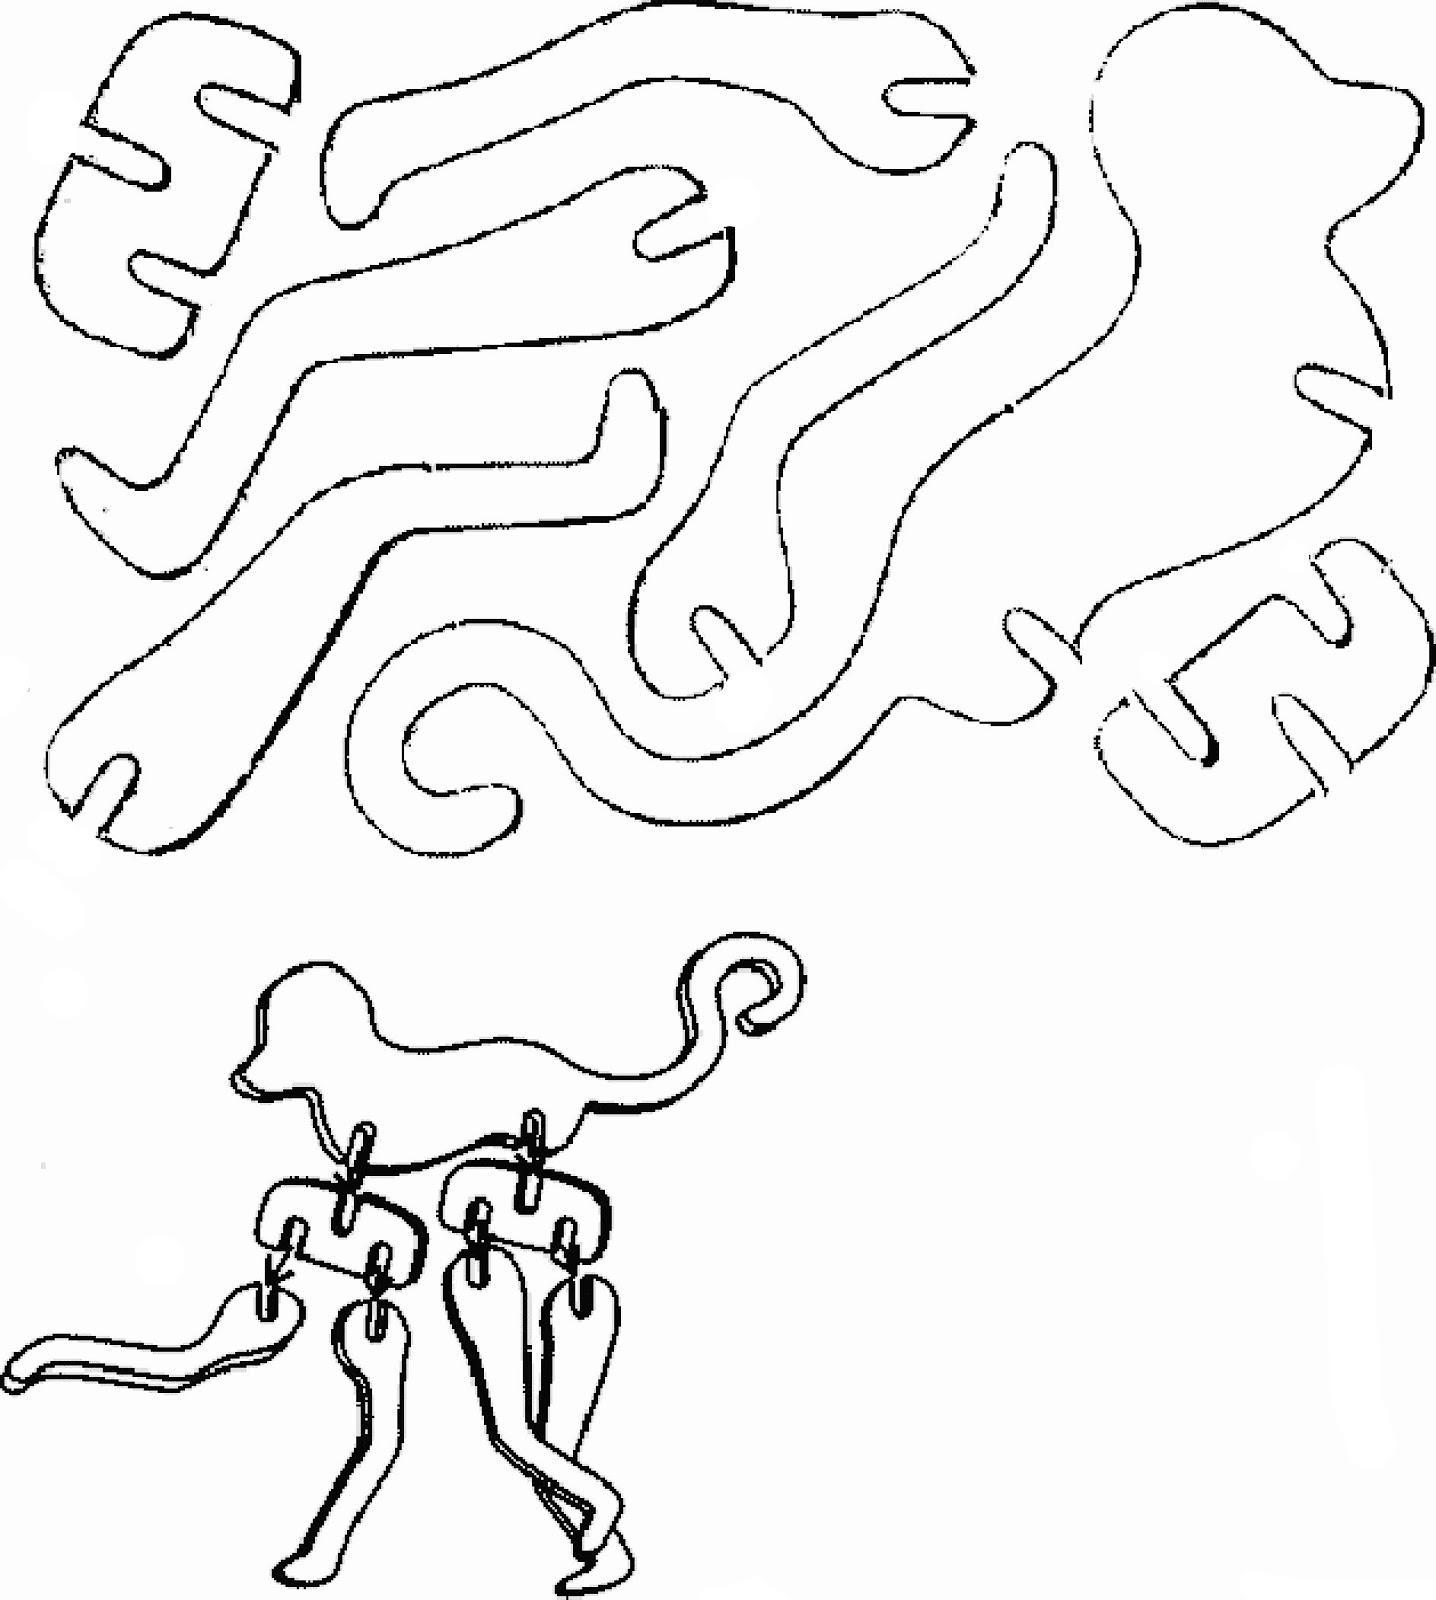 Wood Pattern Drawing At Getdrawings